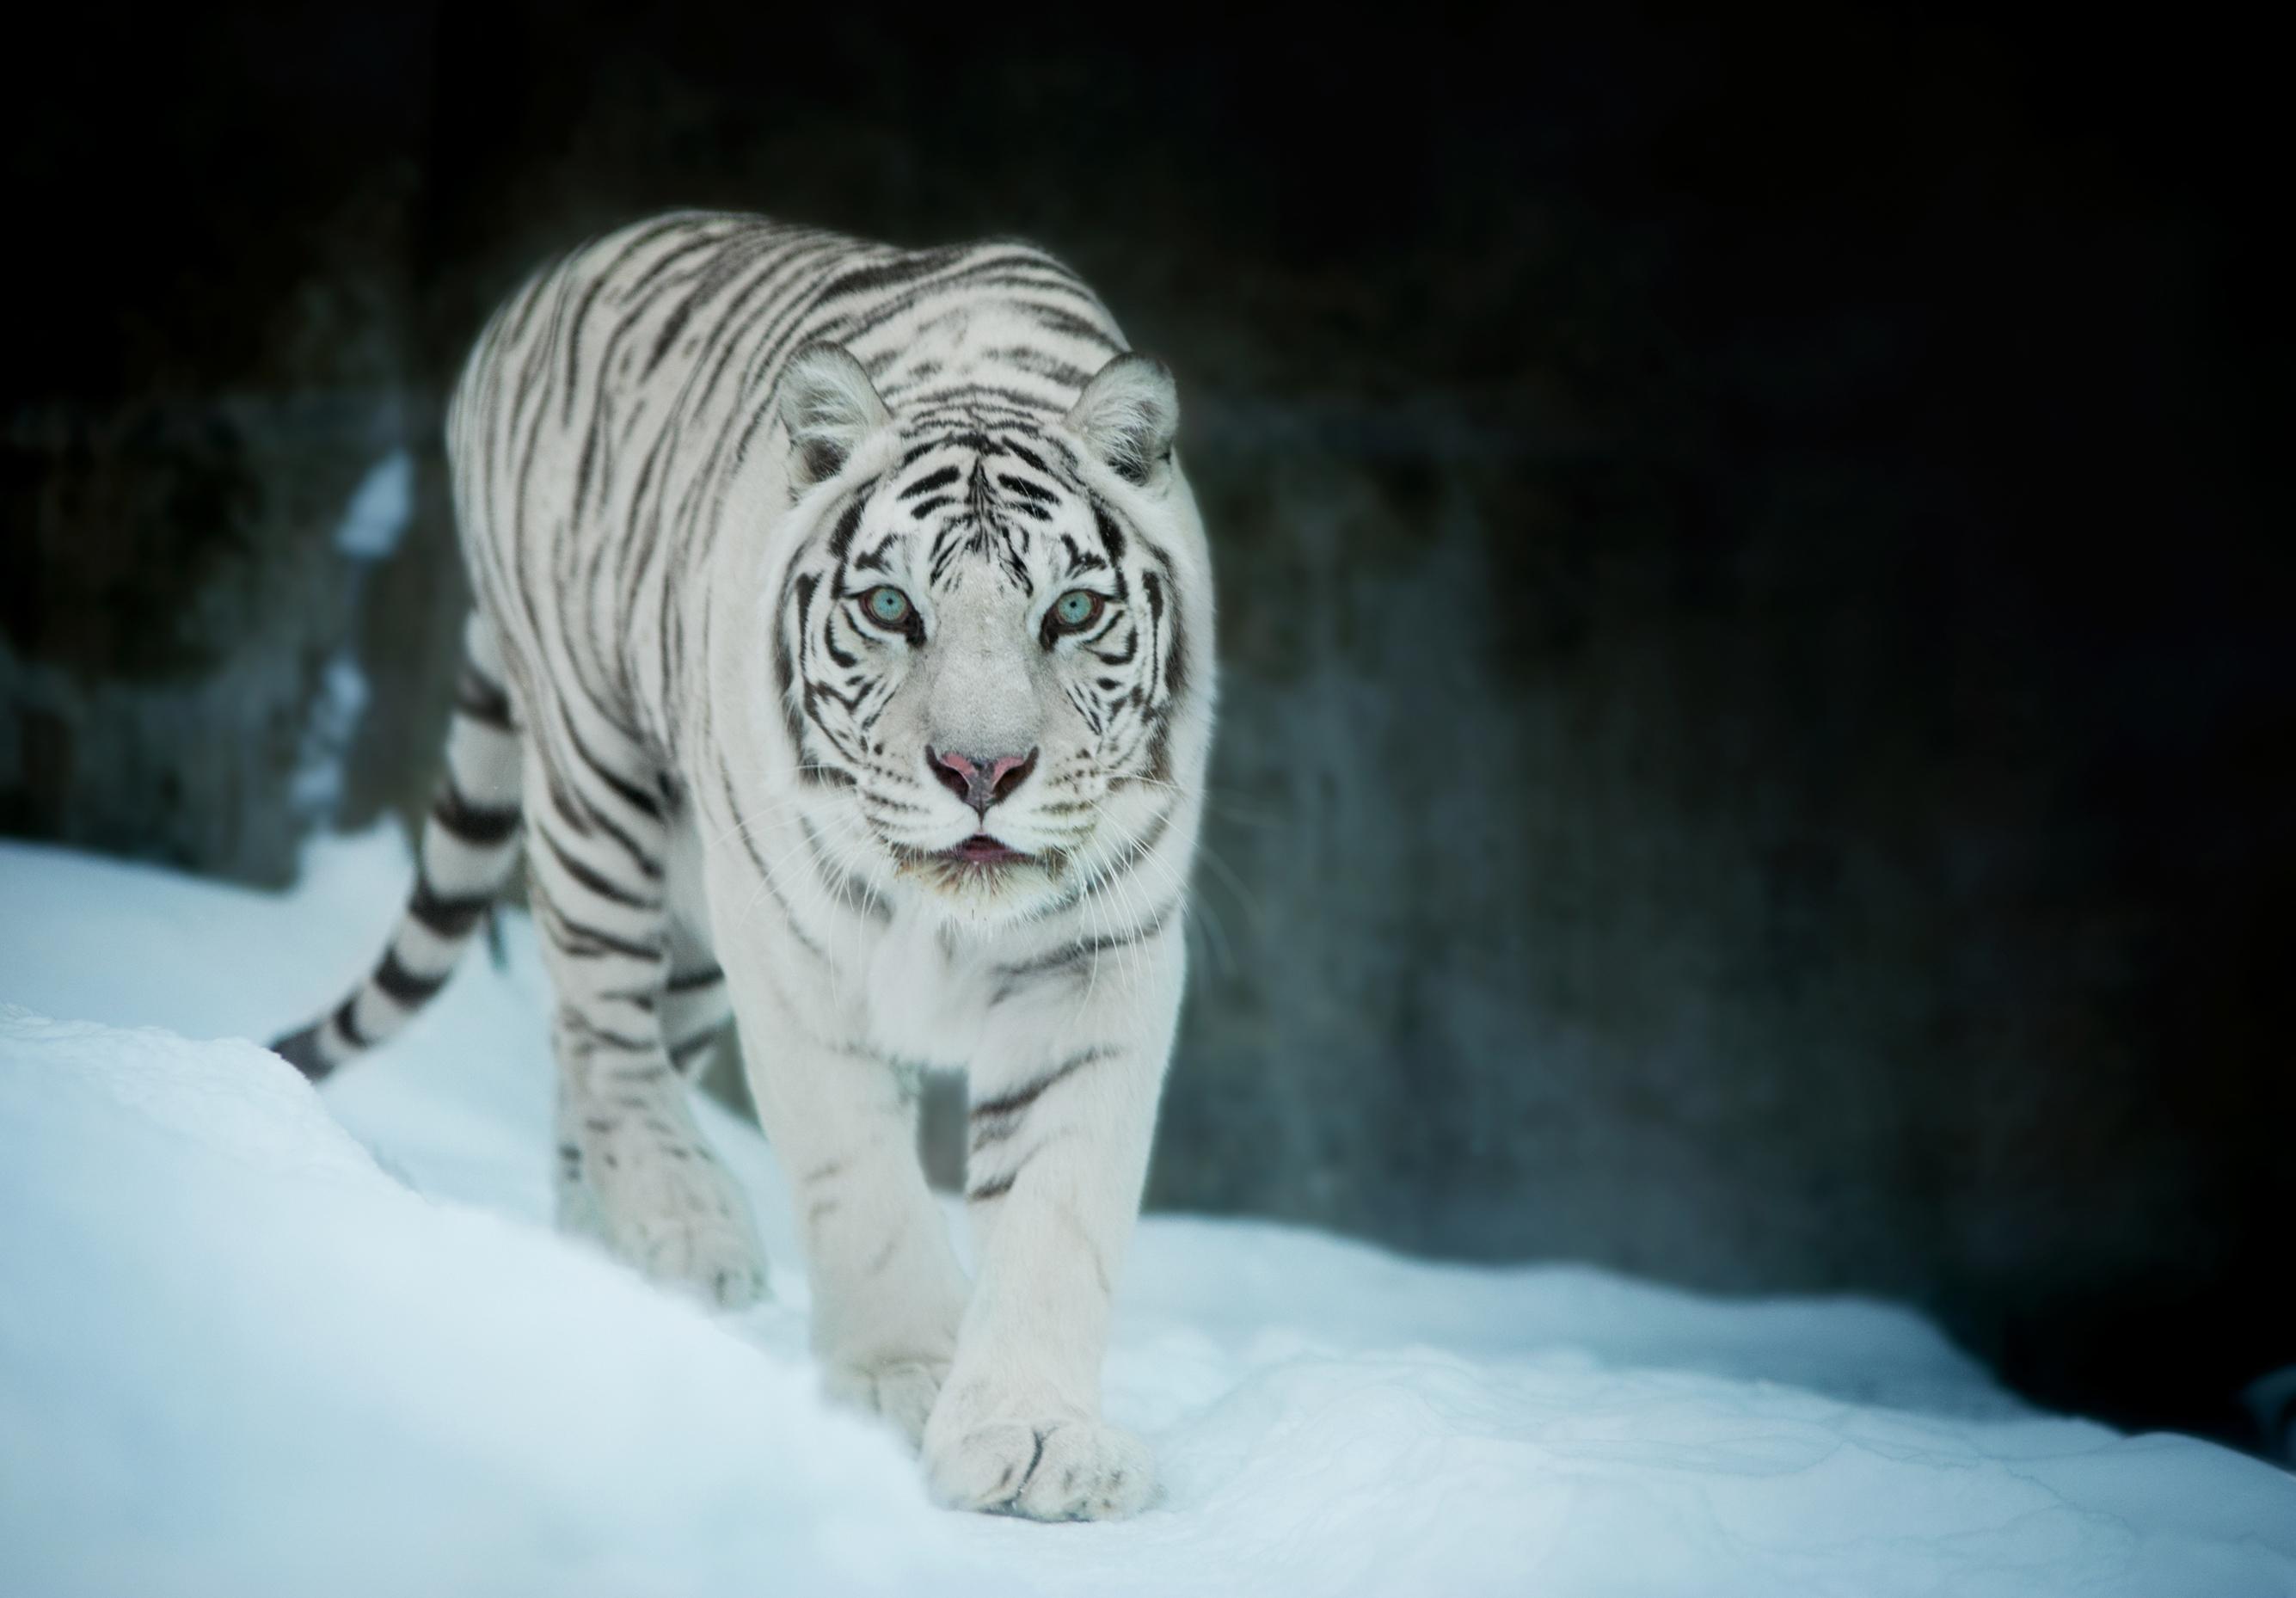 white tiger in snow 1574939437 - White Tiger In Snow -